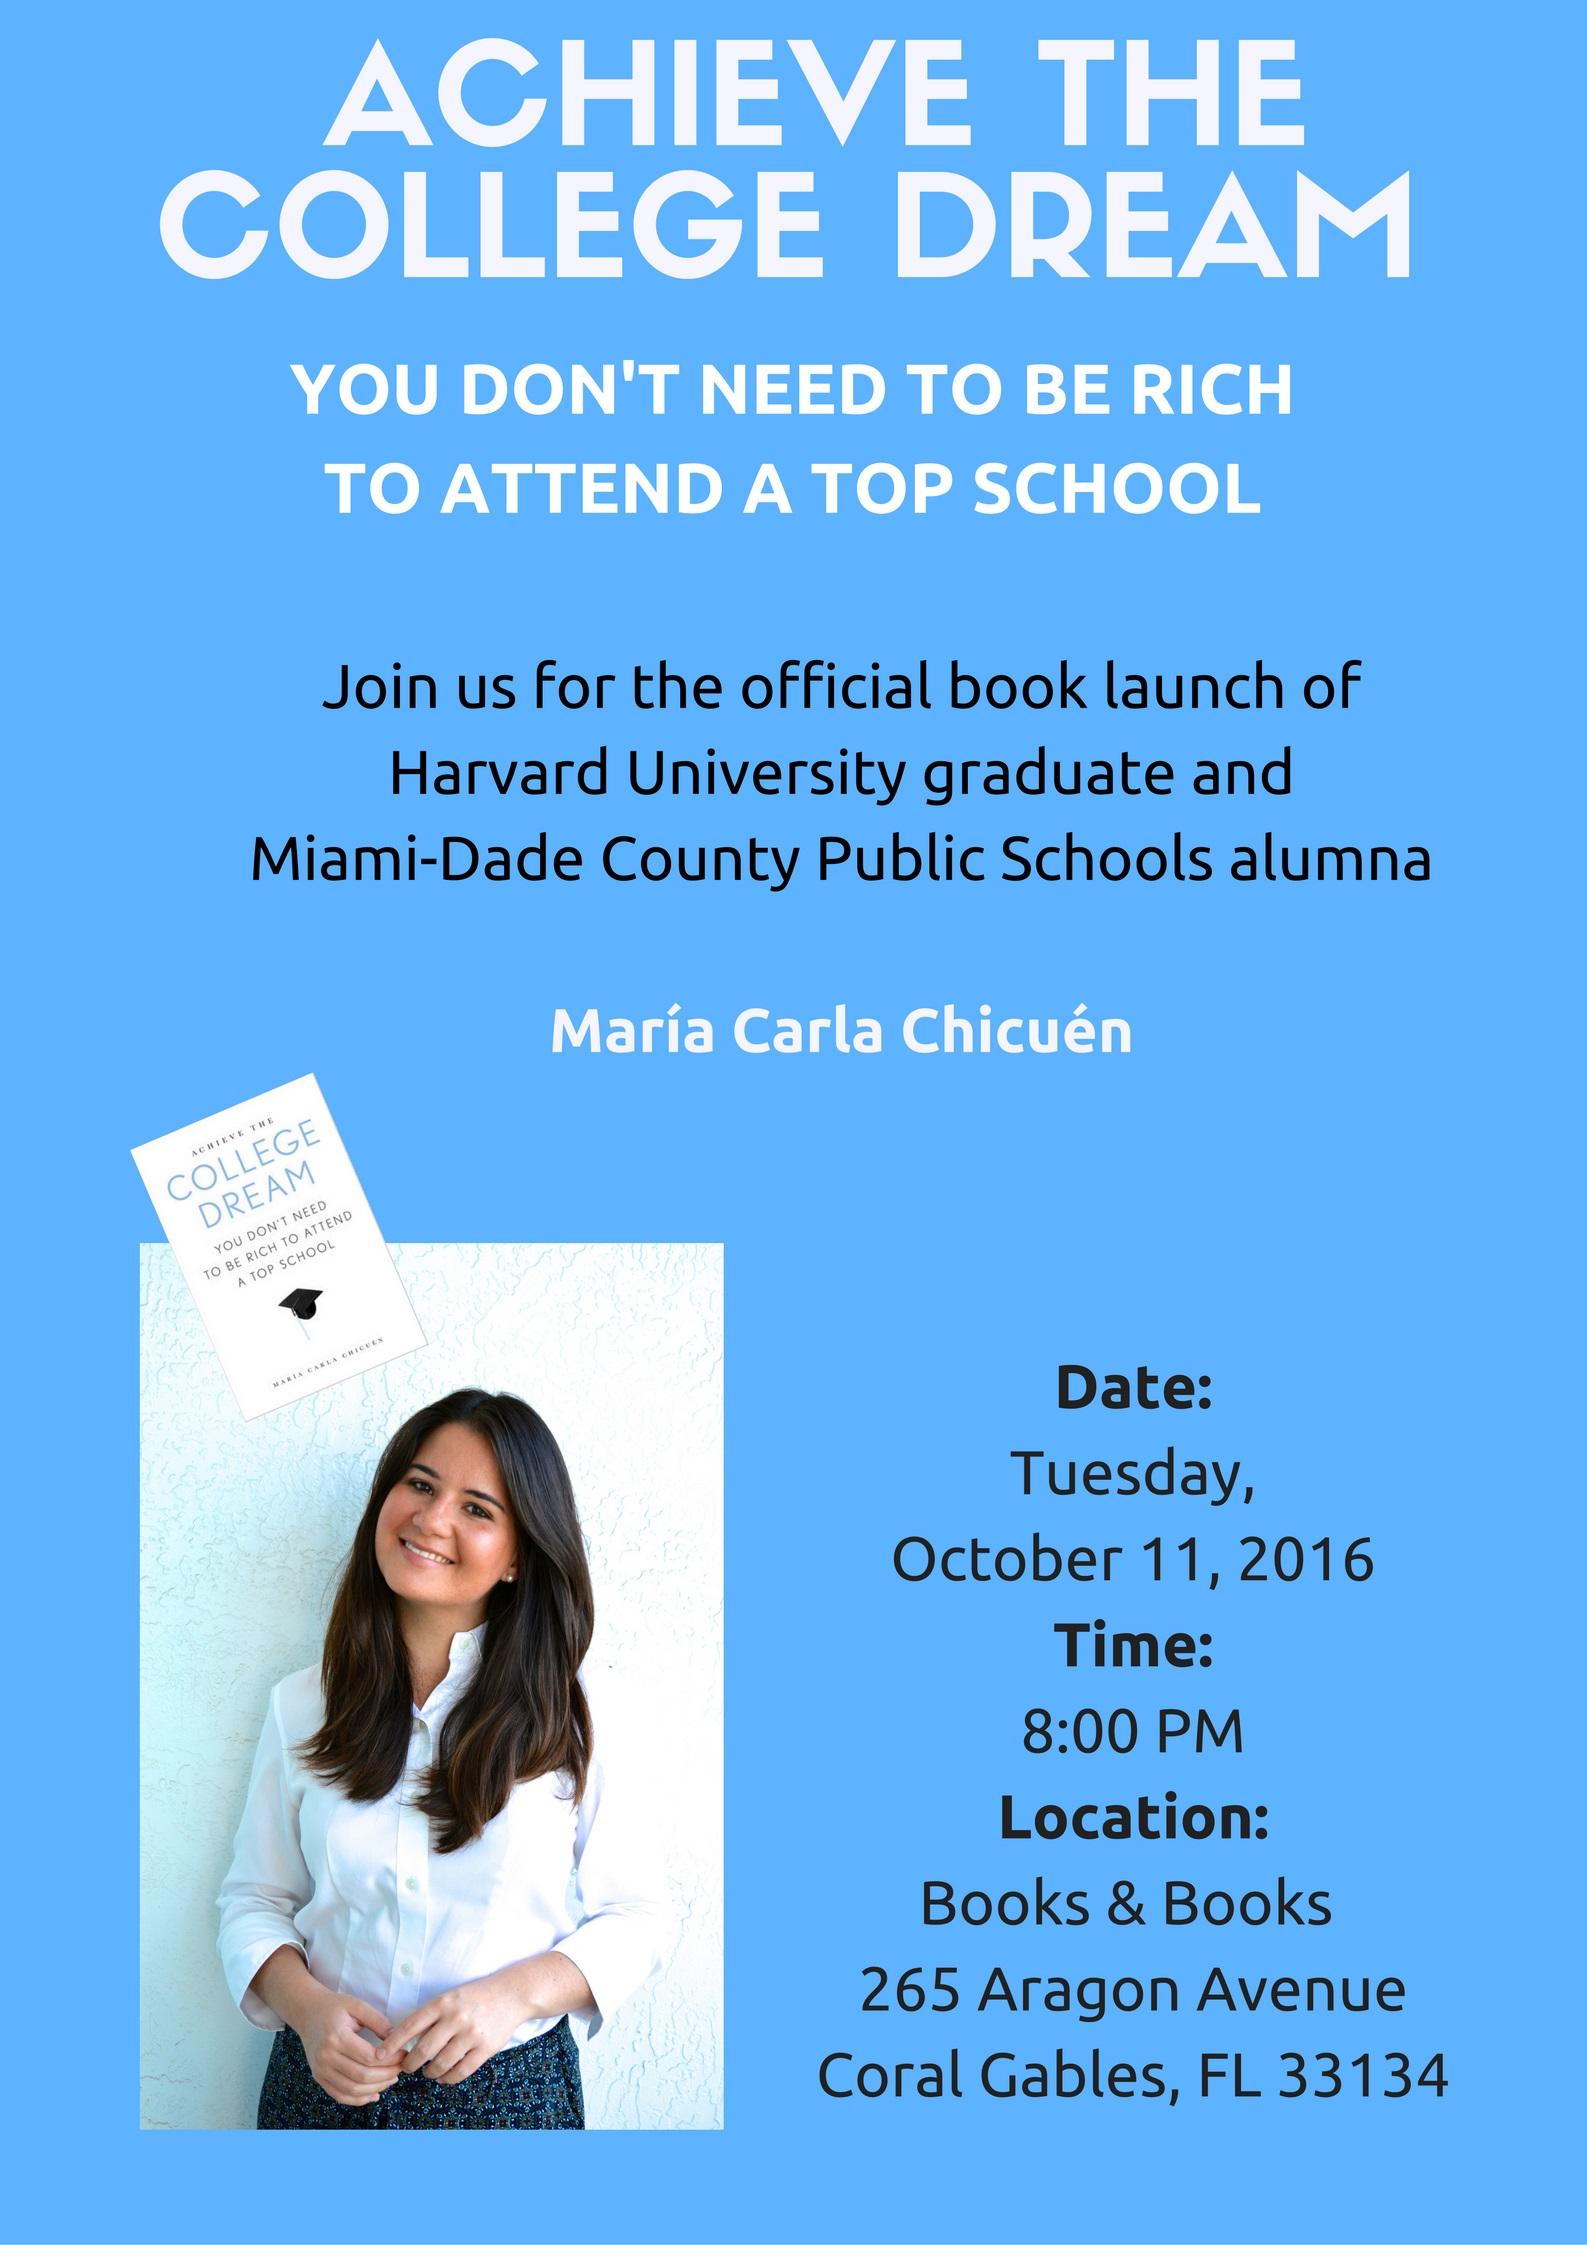 achieve-college-dream-book-launch-announcement--003-